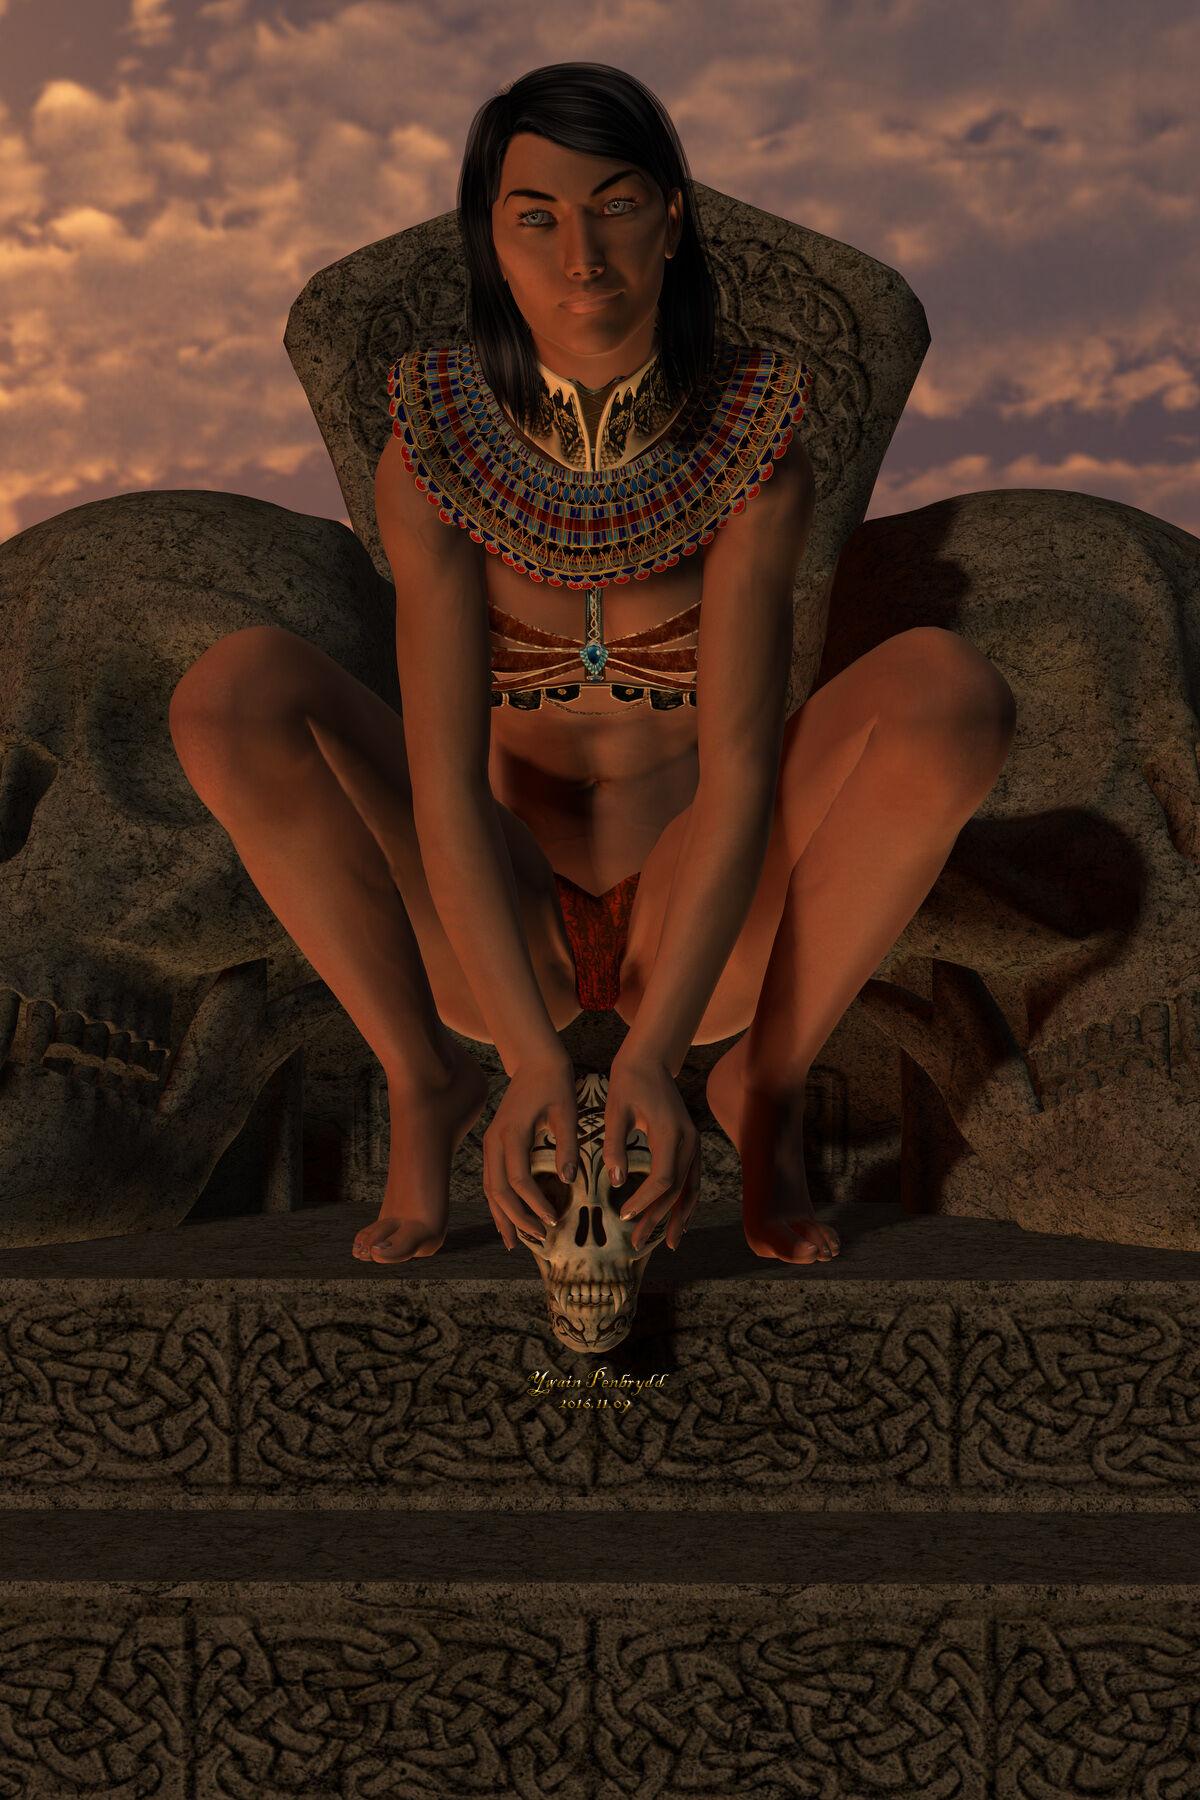 [IMG] 2016-11-03-Bethany-skullthrone-01-fix.jpg